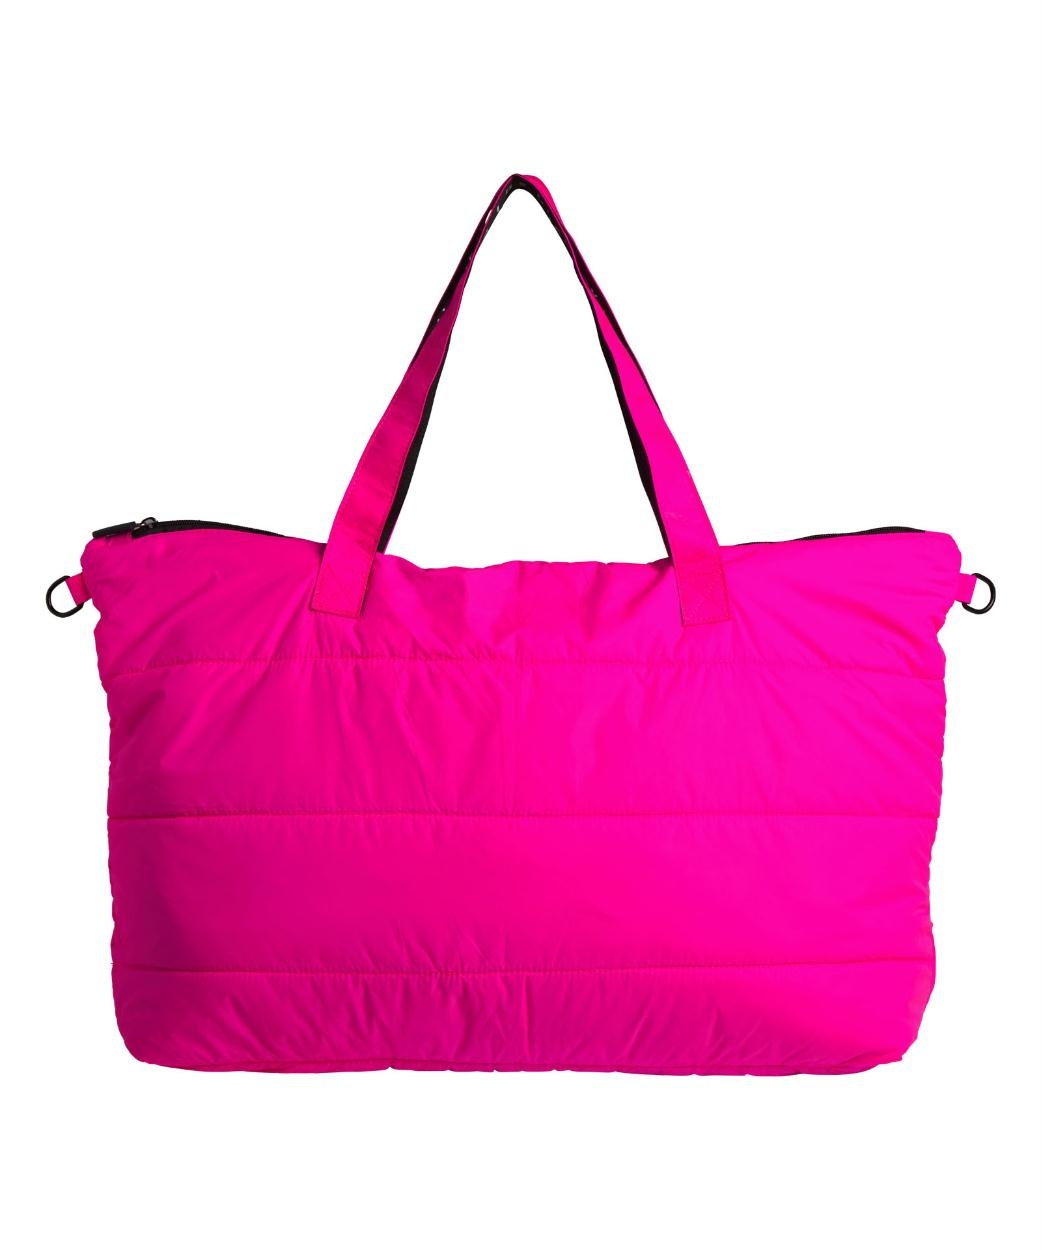 10Days Fluor pink Shopper Puffed Nylon 20.950.9103/8